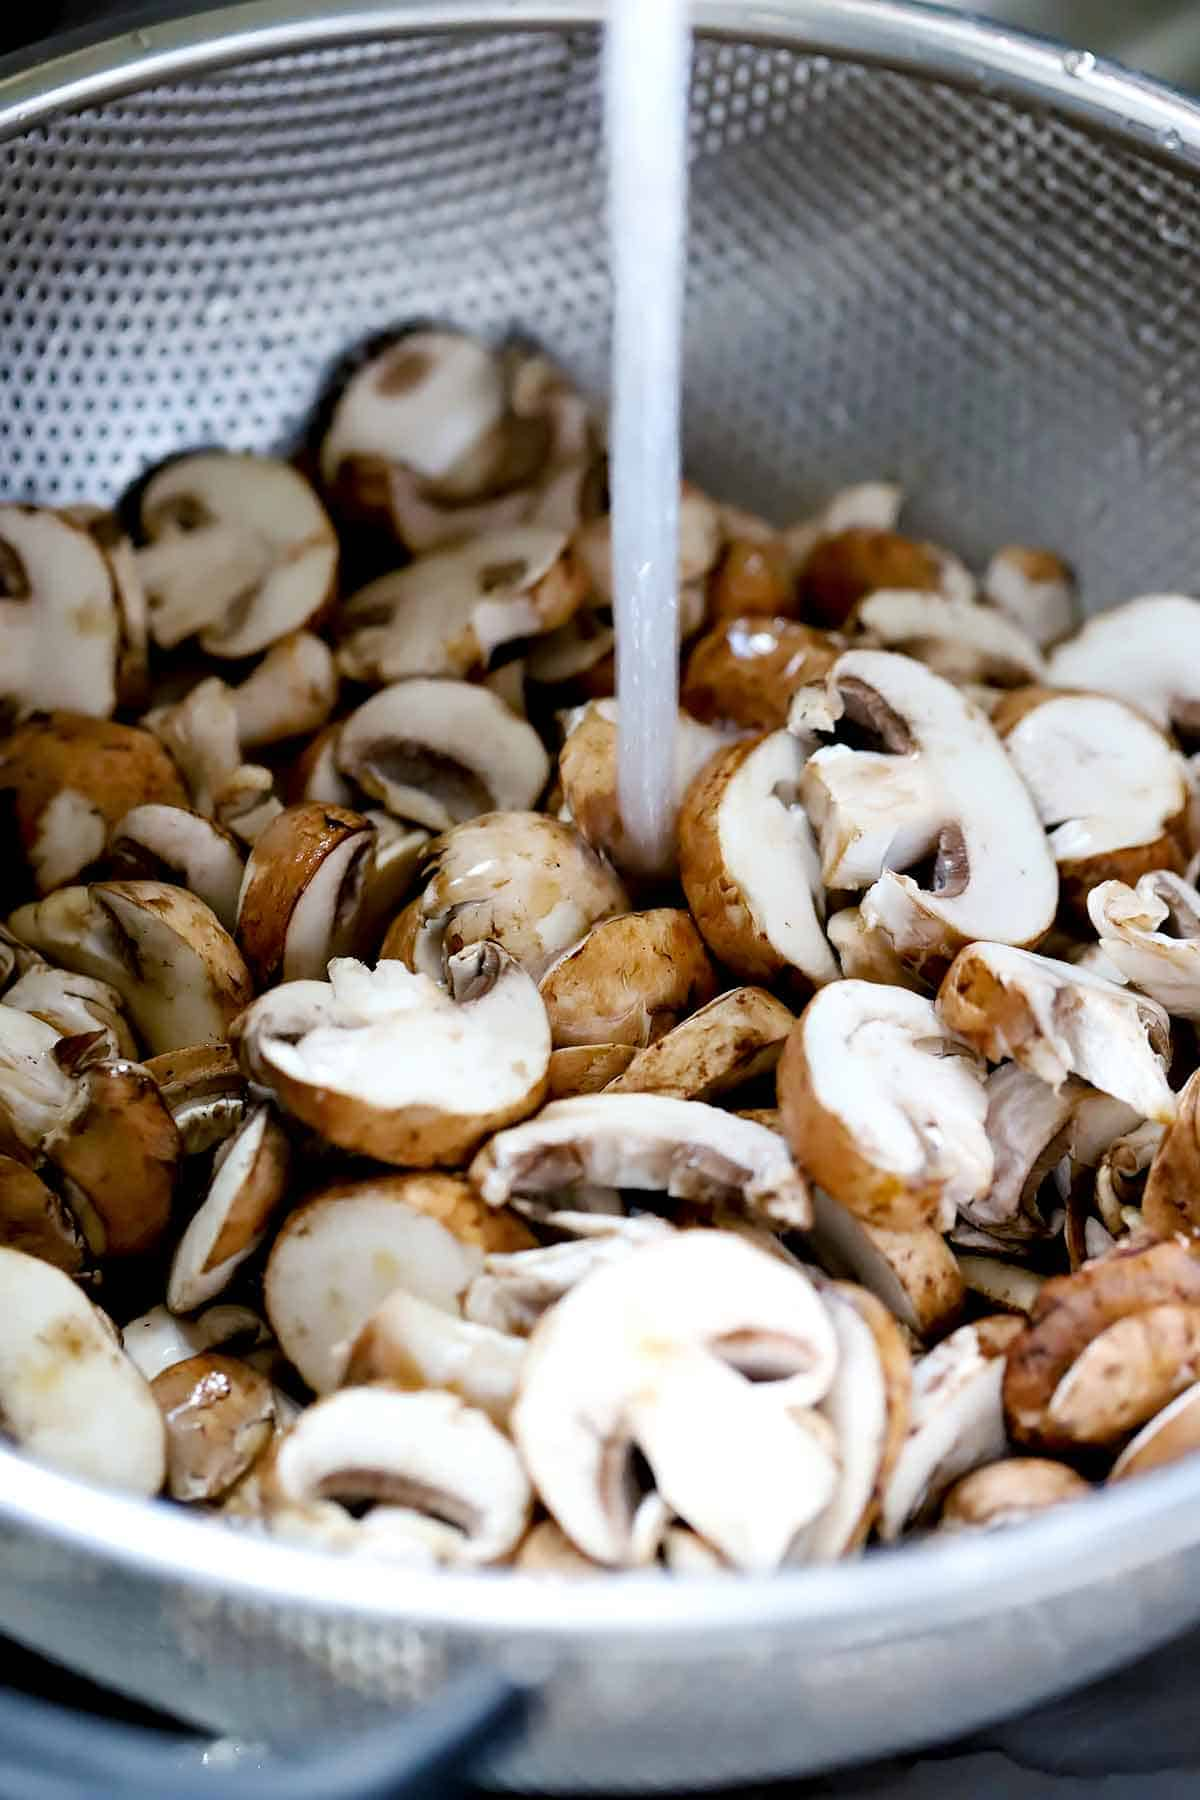 Washing sliced mushrooms in a colander.